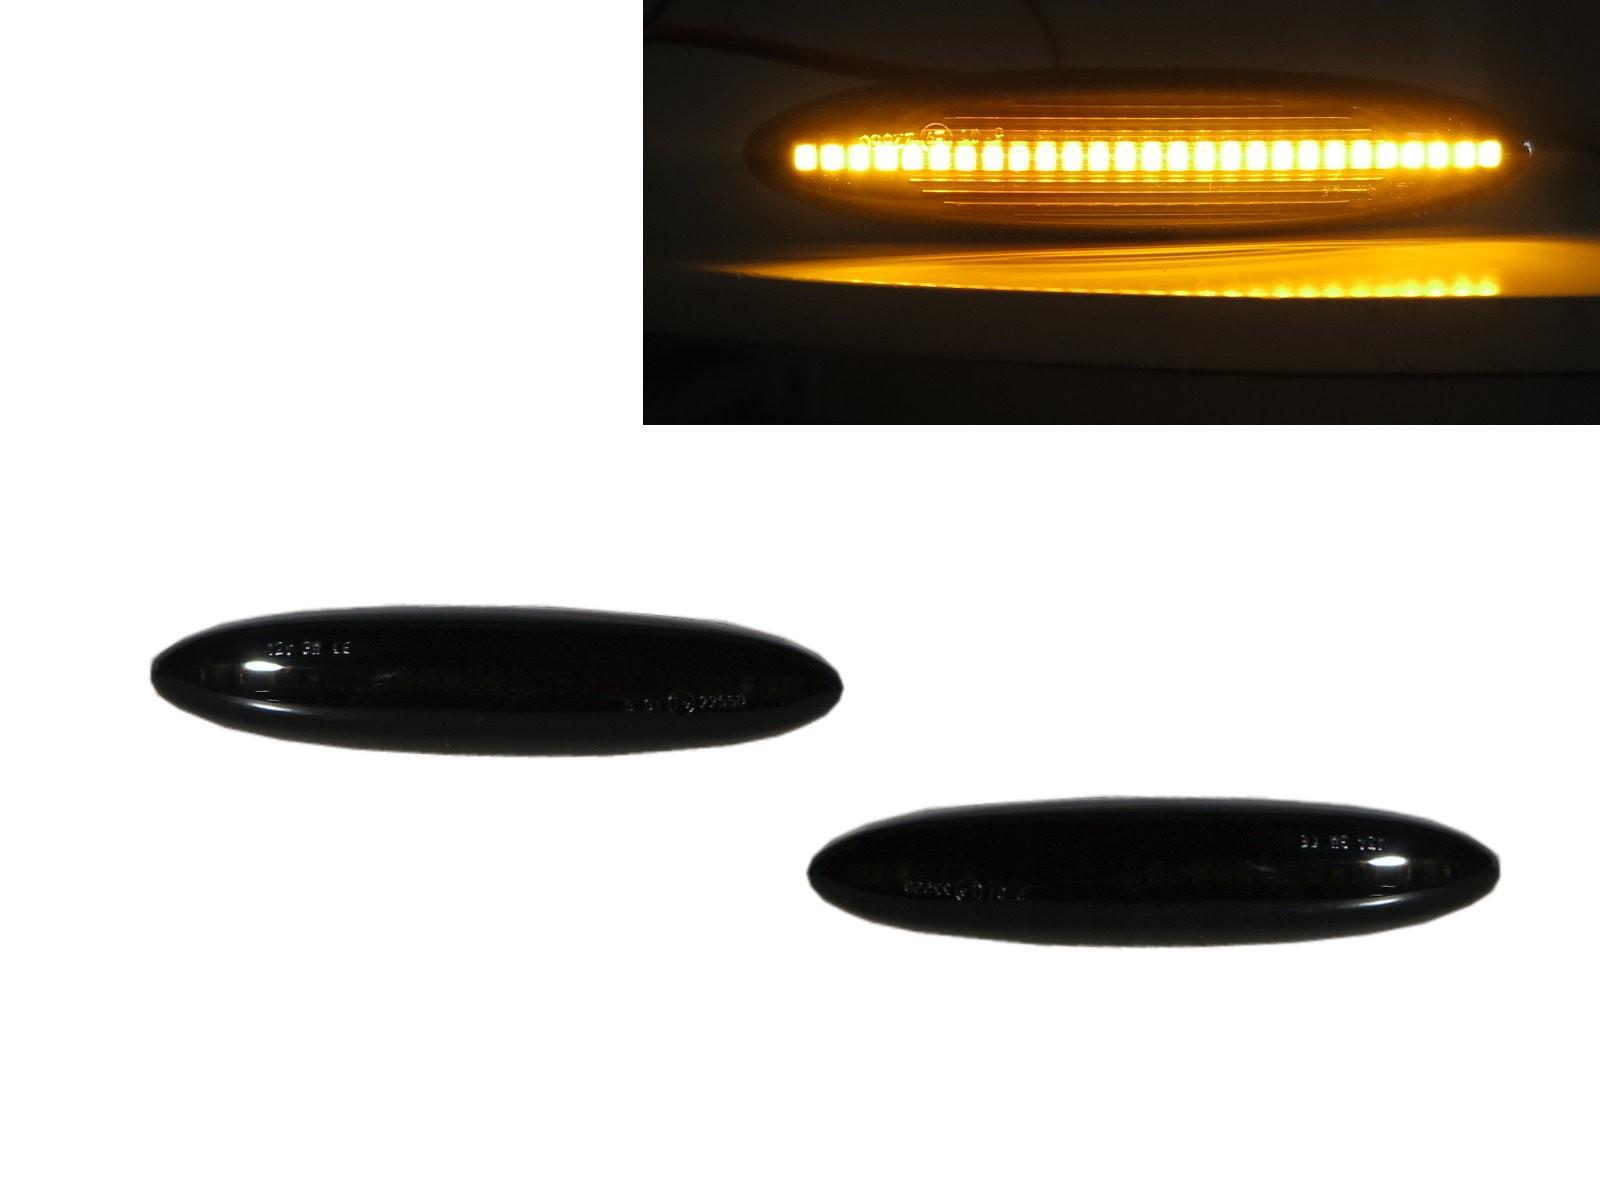 CrazyTheGod ES350 2006-2009 Coupe/Convertible 2D LED Dynamic Turn signal Side Fender Marker Light Lamp Smoke for LEXUS